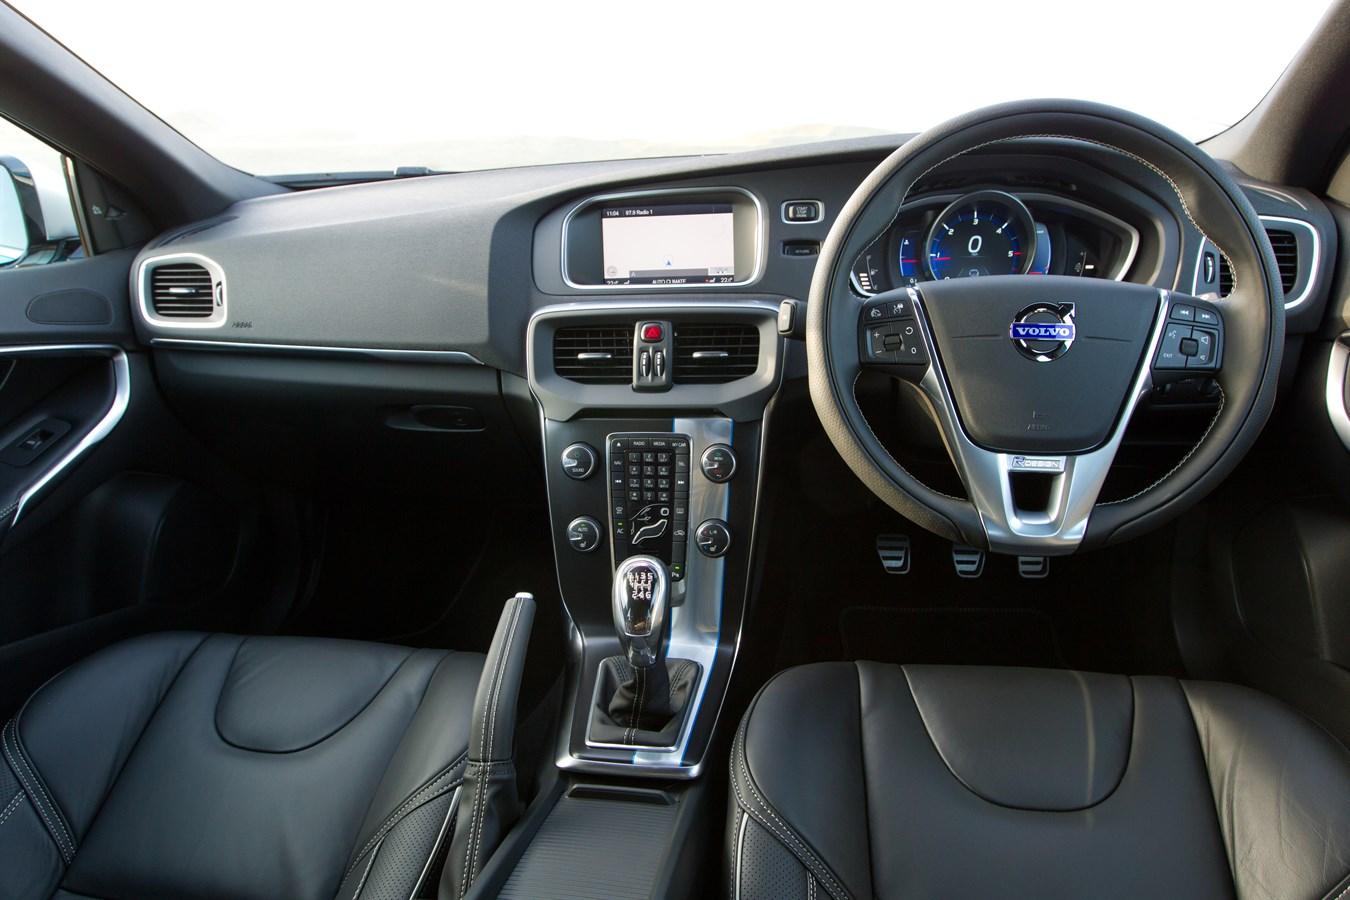 Interior Dashboard Image Of The All New Volvo V40 R Design Volvo Car Uk Media Newsroom